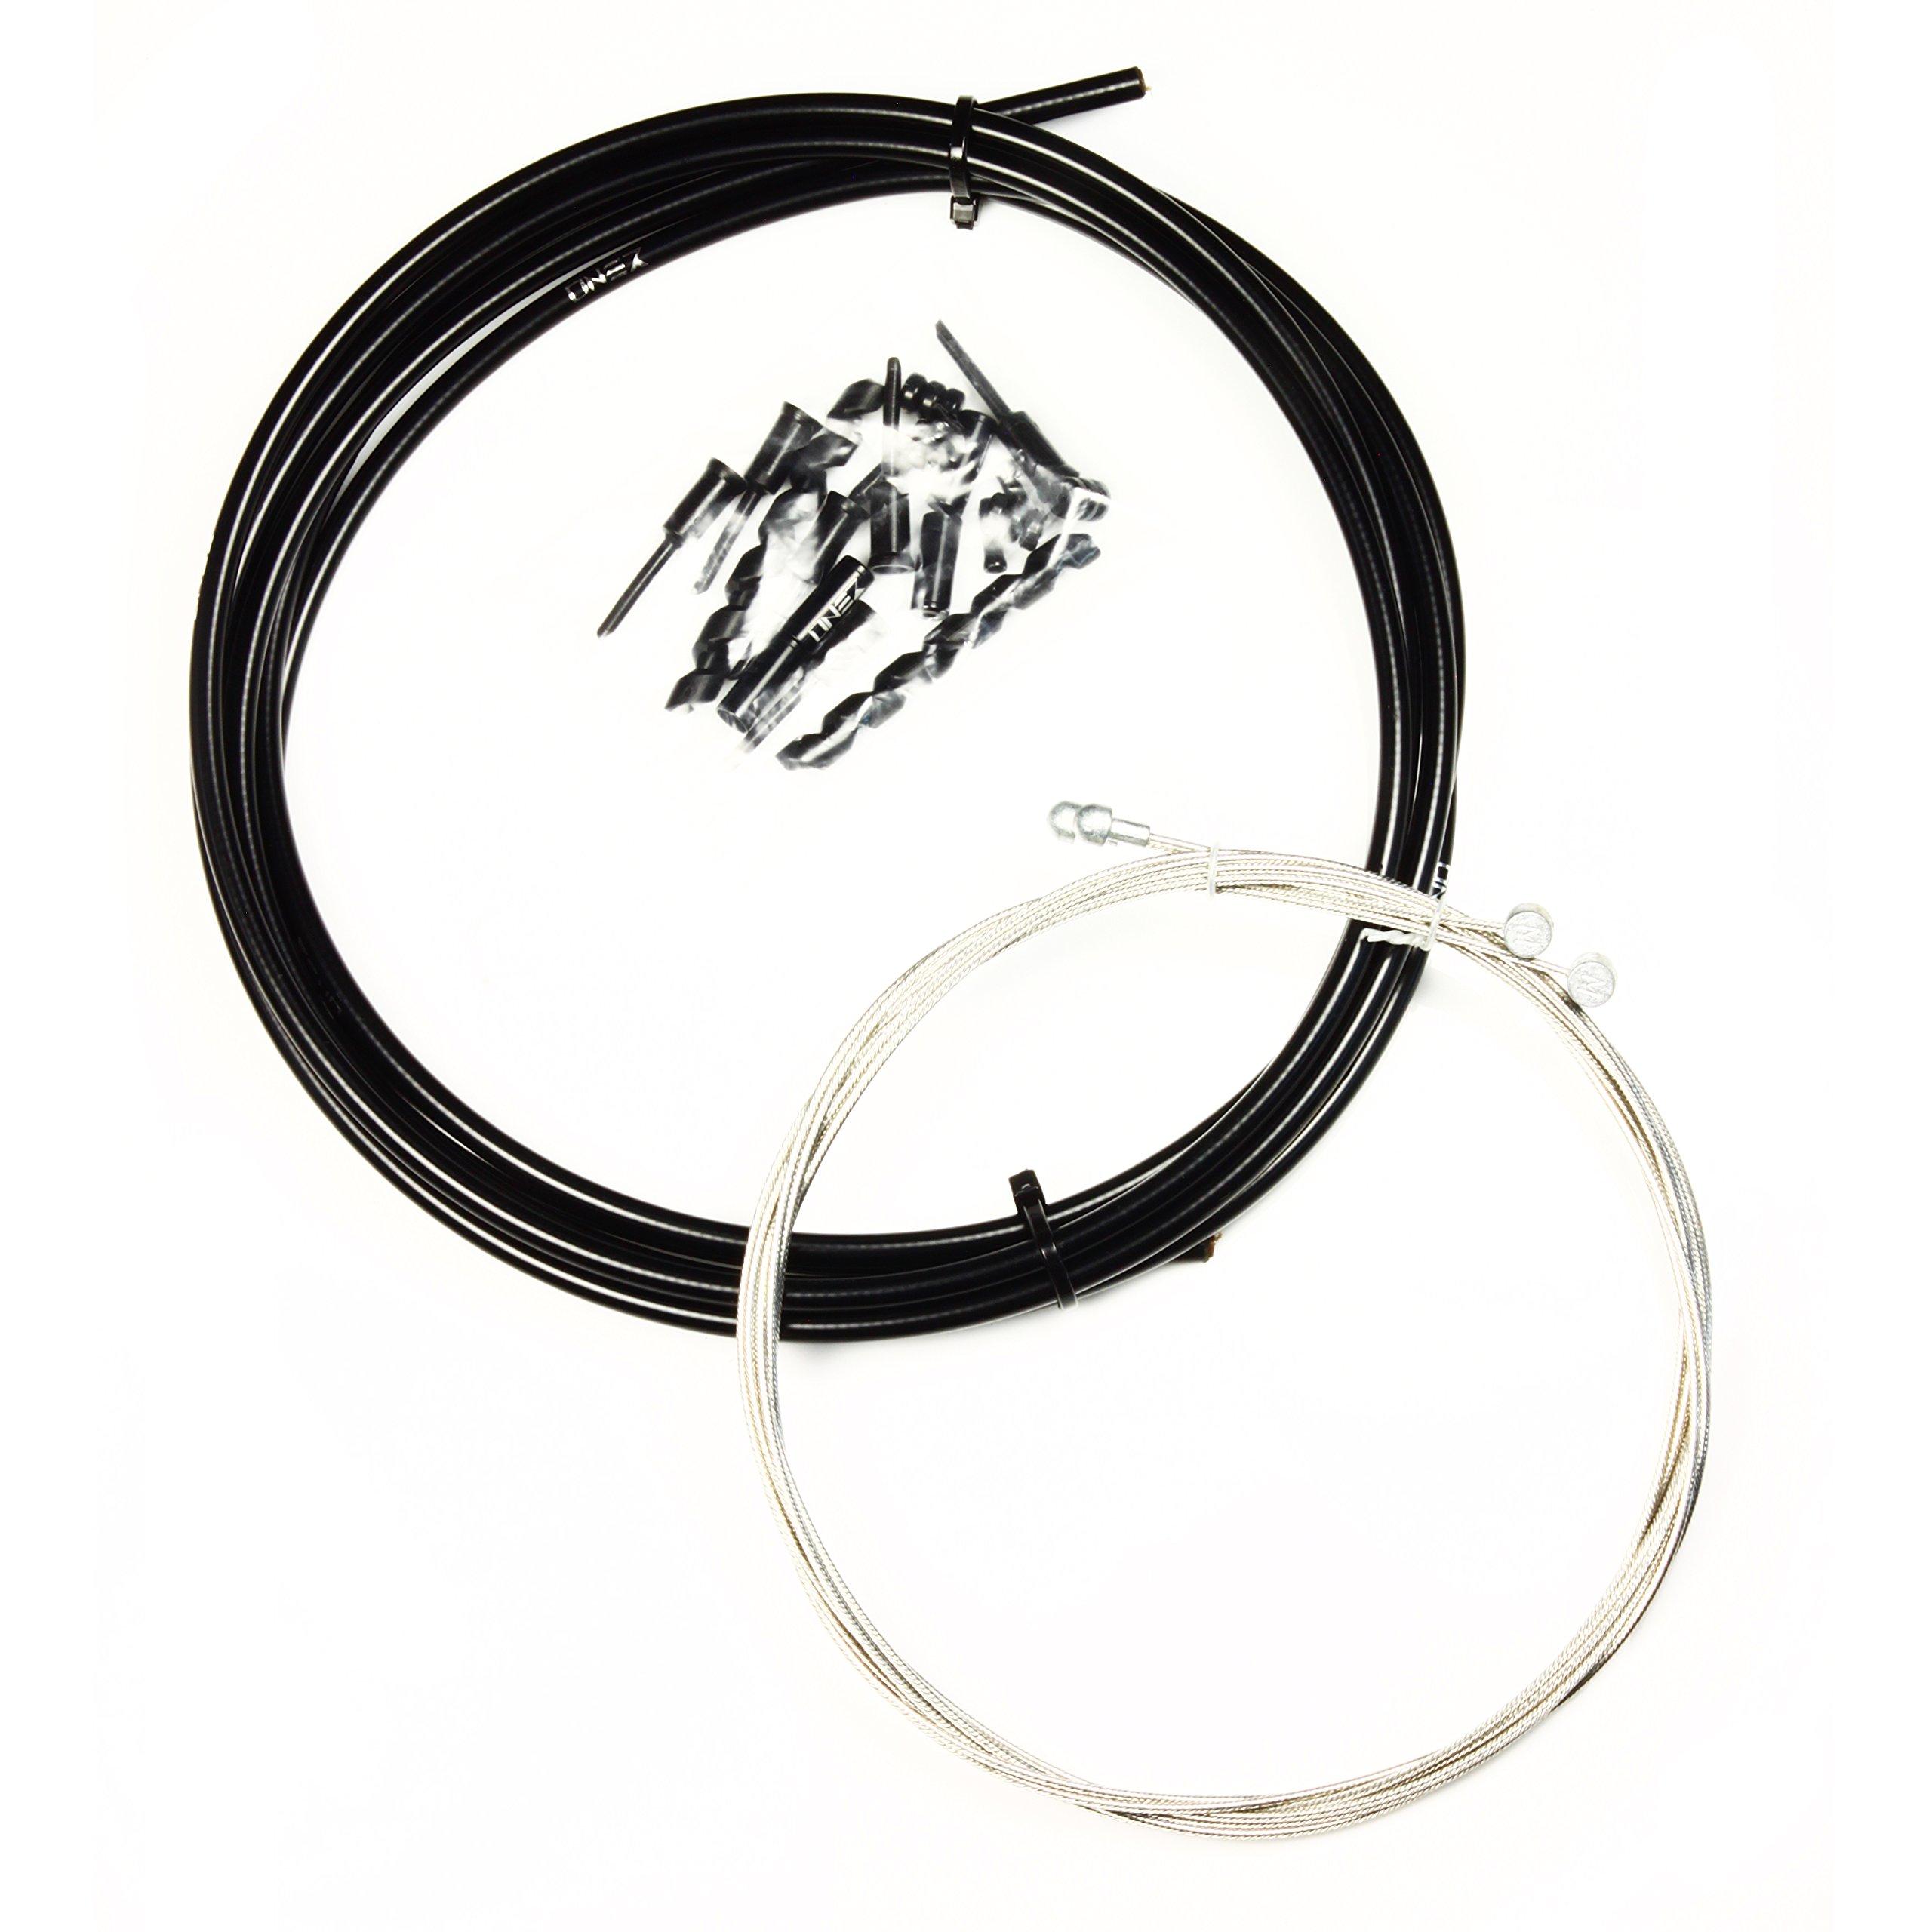 Zeno Bicycle Bike Brake Cable Kit Universal for Mountain Bike and Road Bike